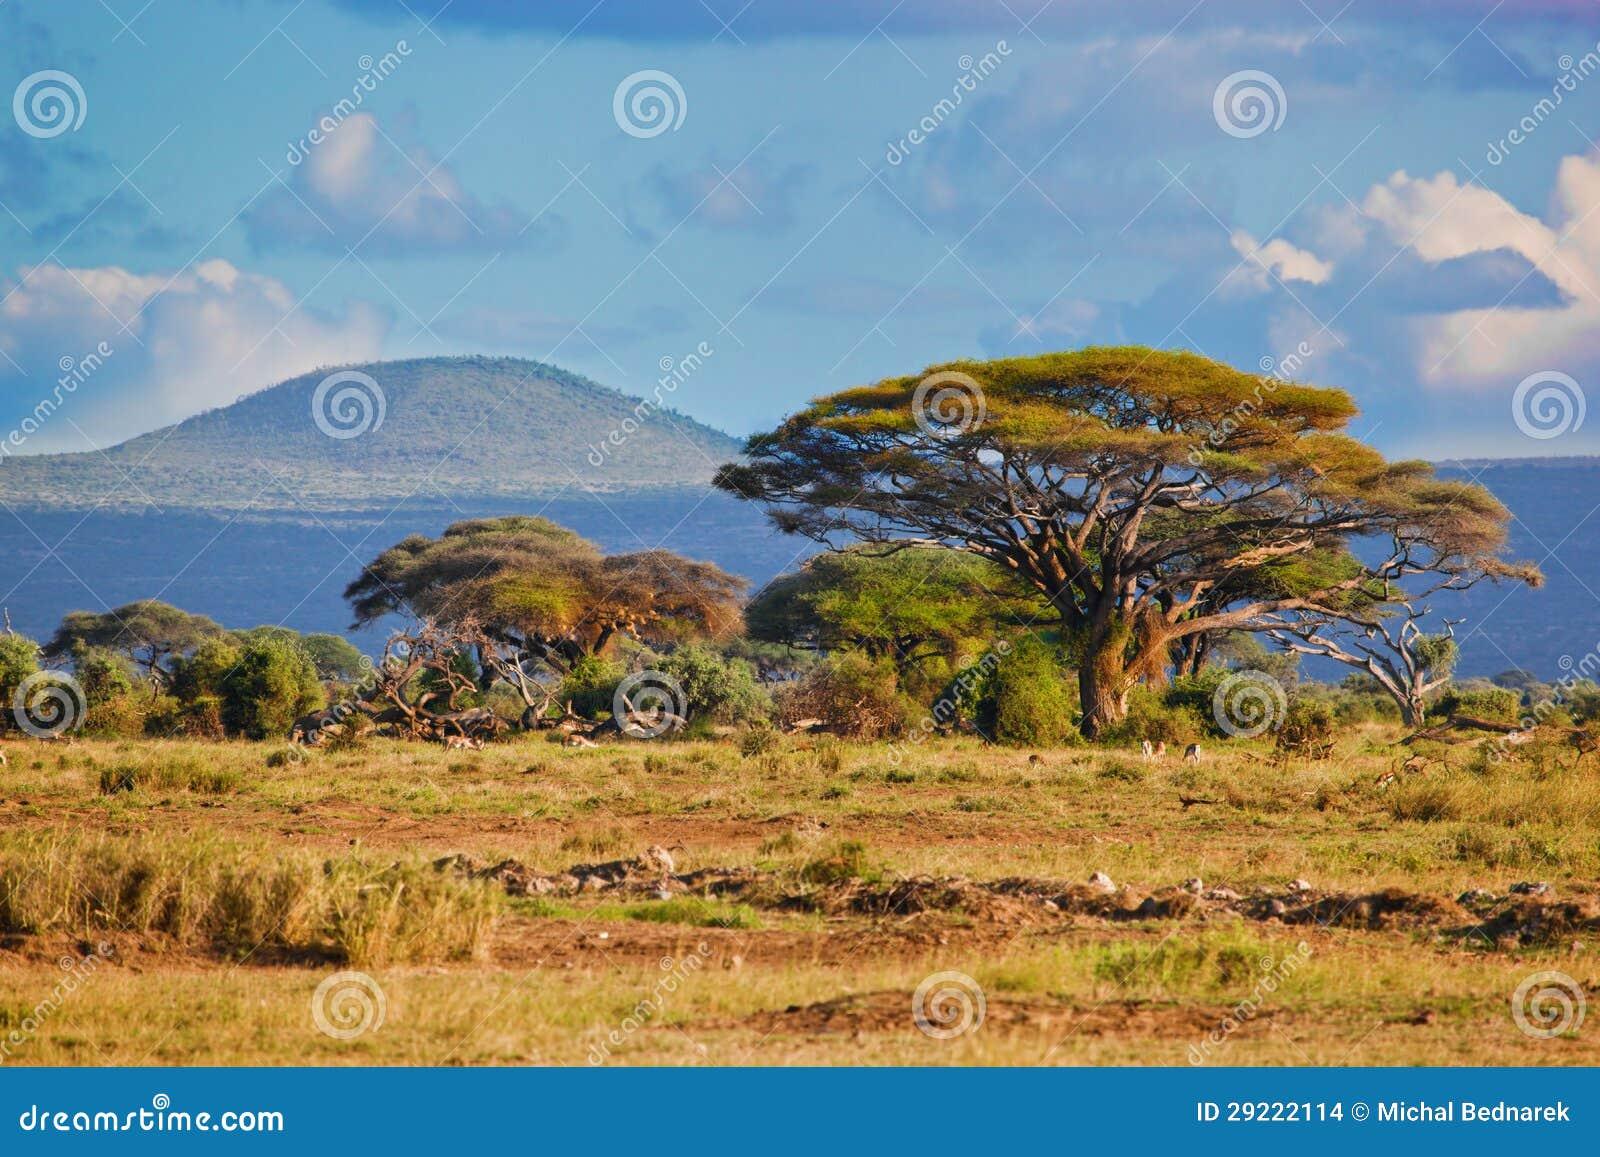 Savanna landscape in Africa, Amboseli, Kenya